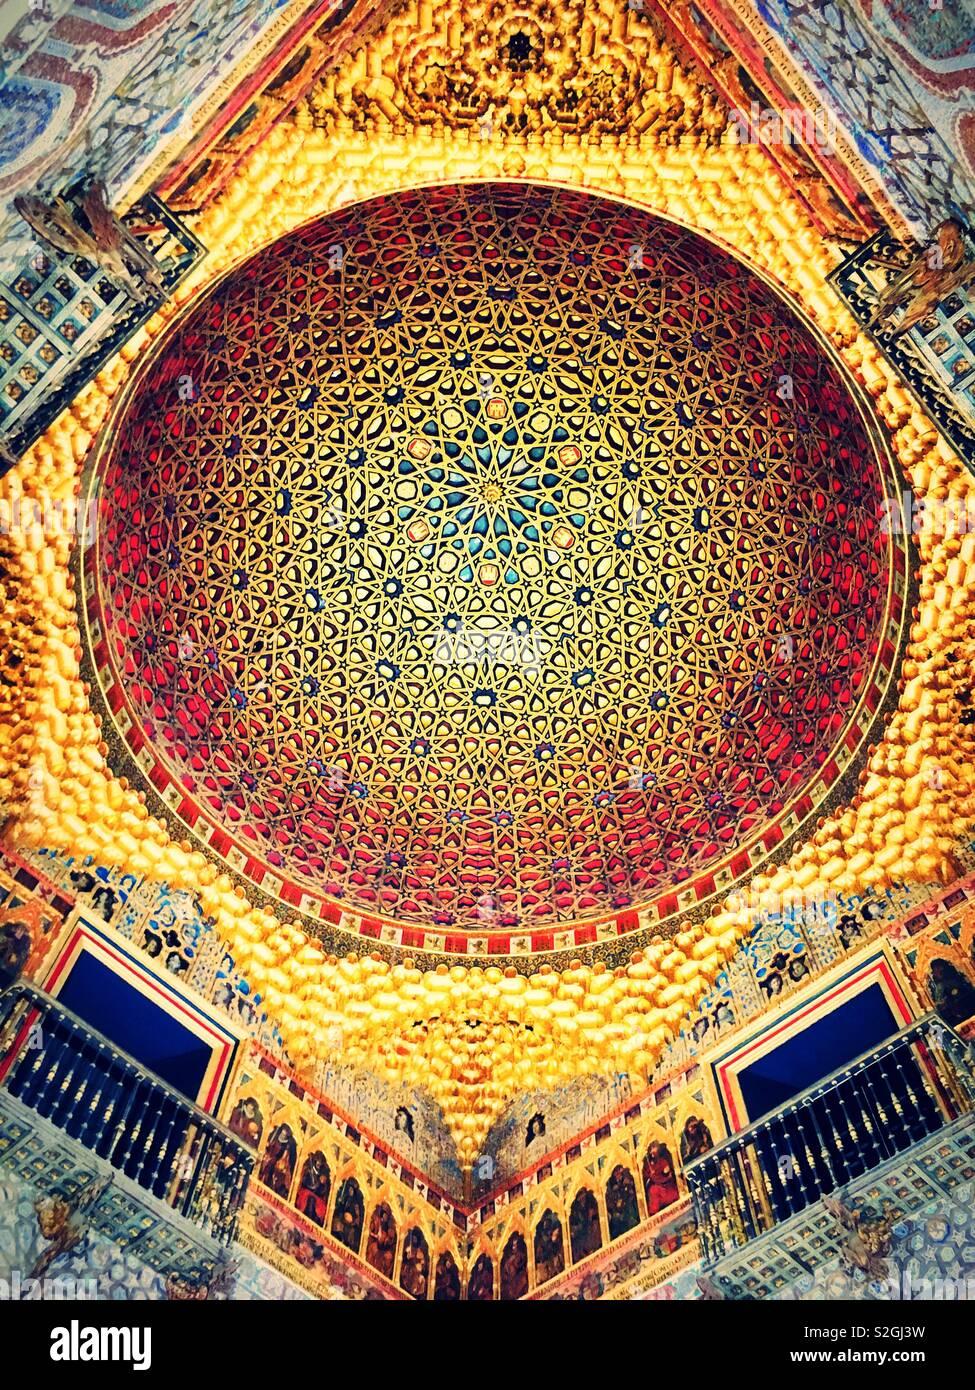 El Real Alcázar de Sevilla - techo Foto de stock